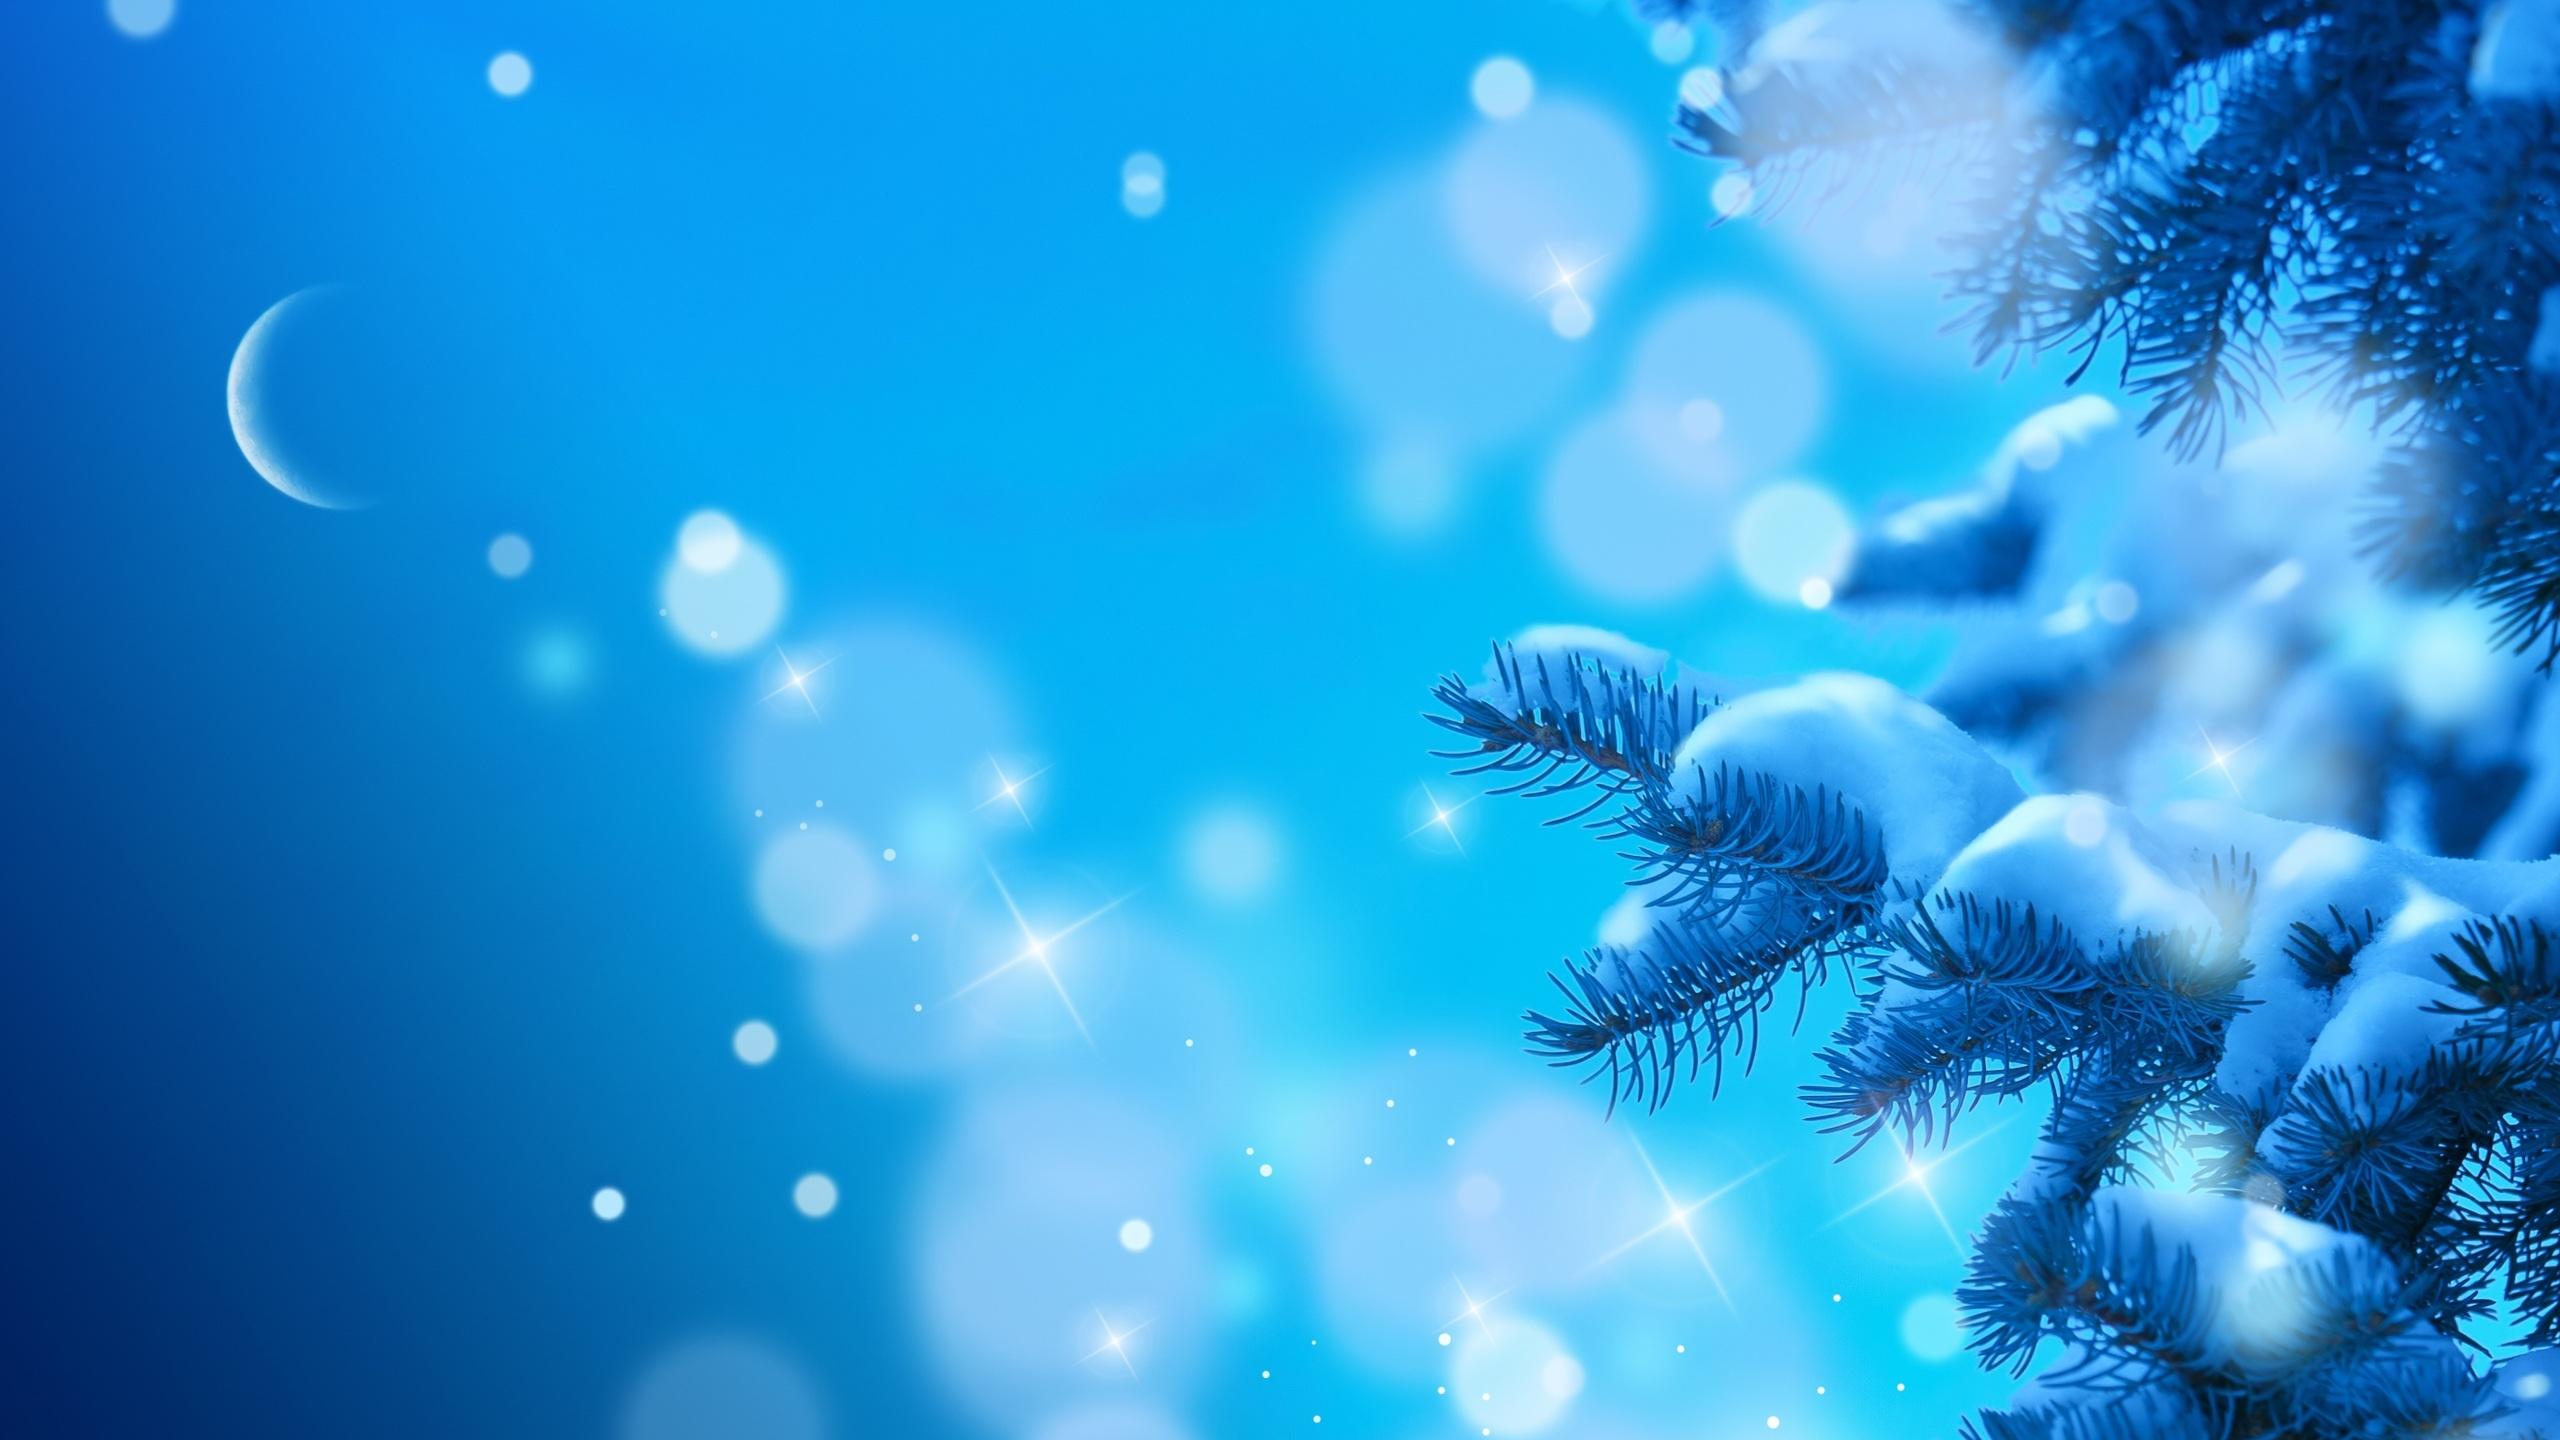 blue background winter art wallpapers